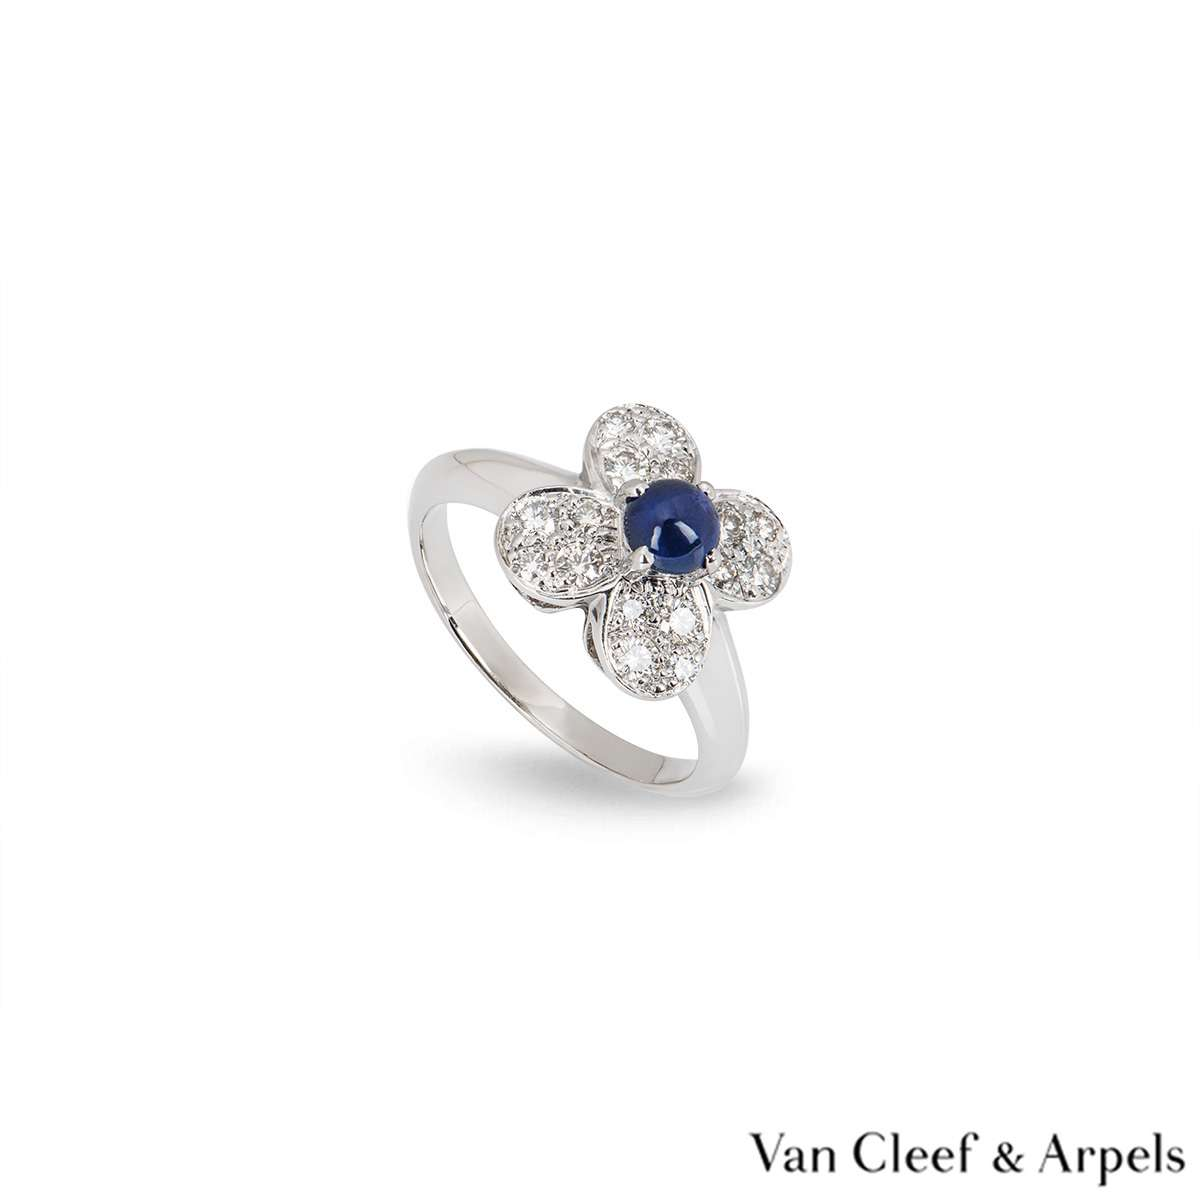 Van Cleef & Arpels White Gold Sapphire & Diamond Alhambra Ring